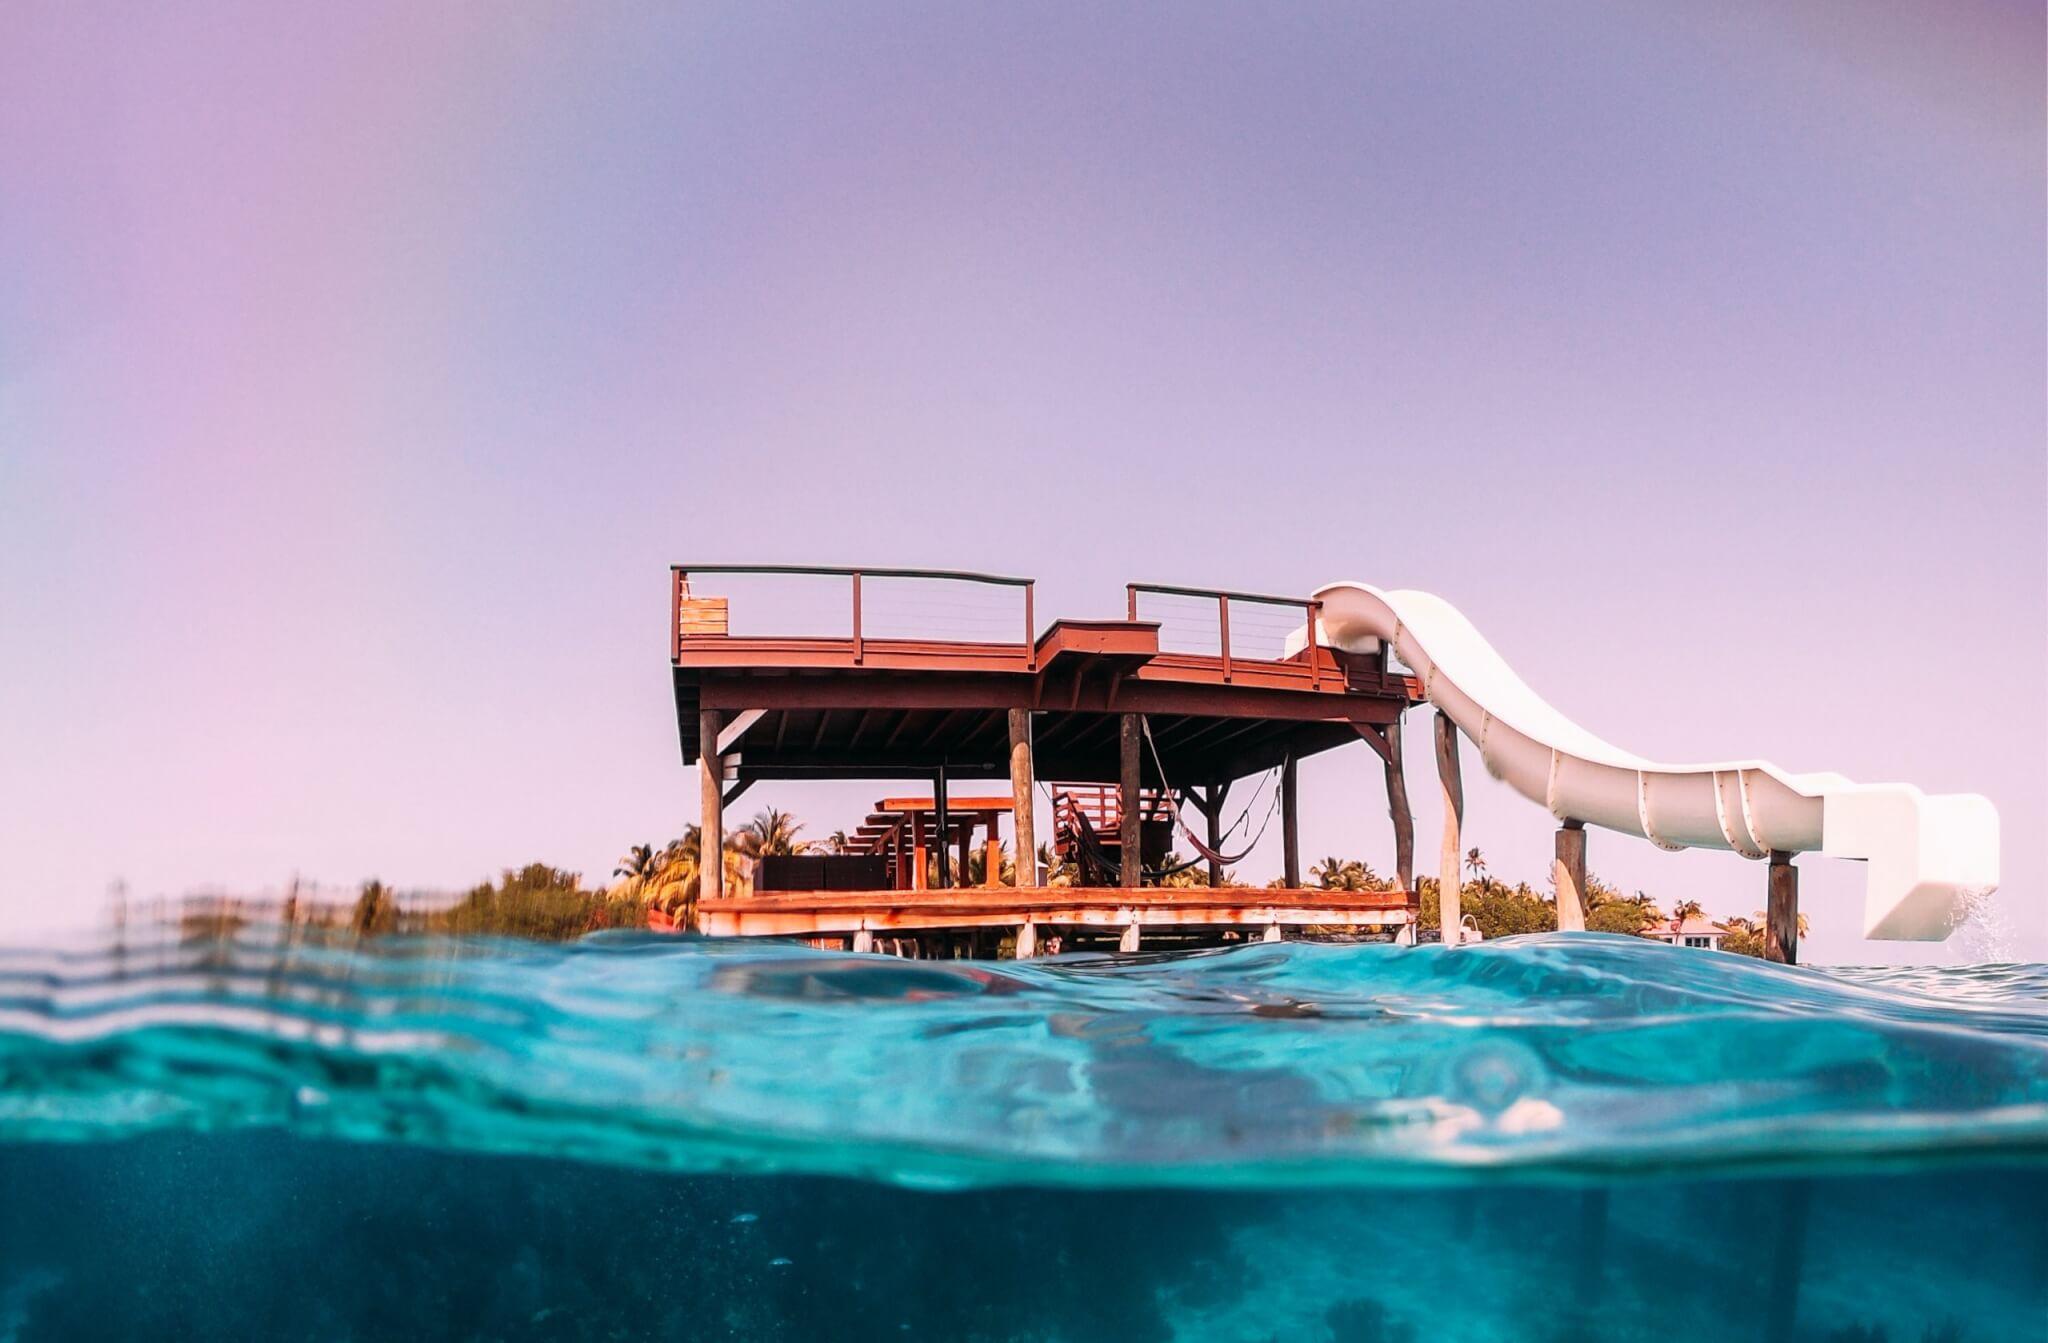 Island Slide